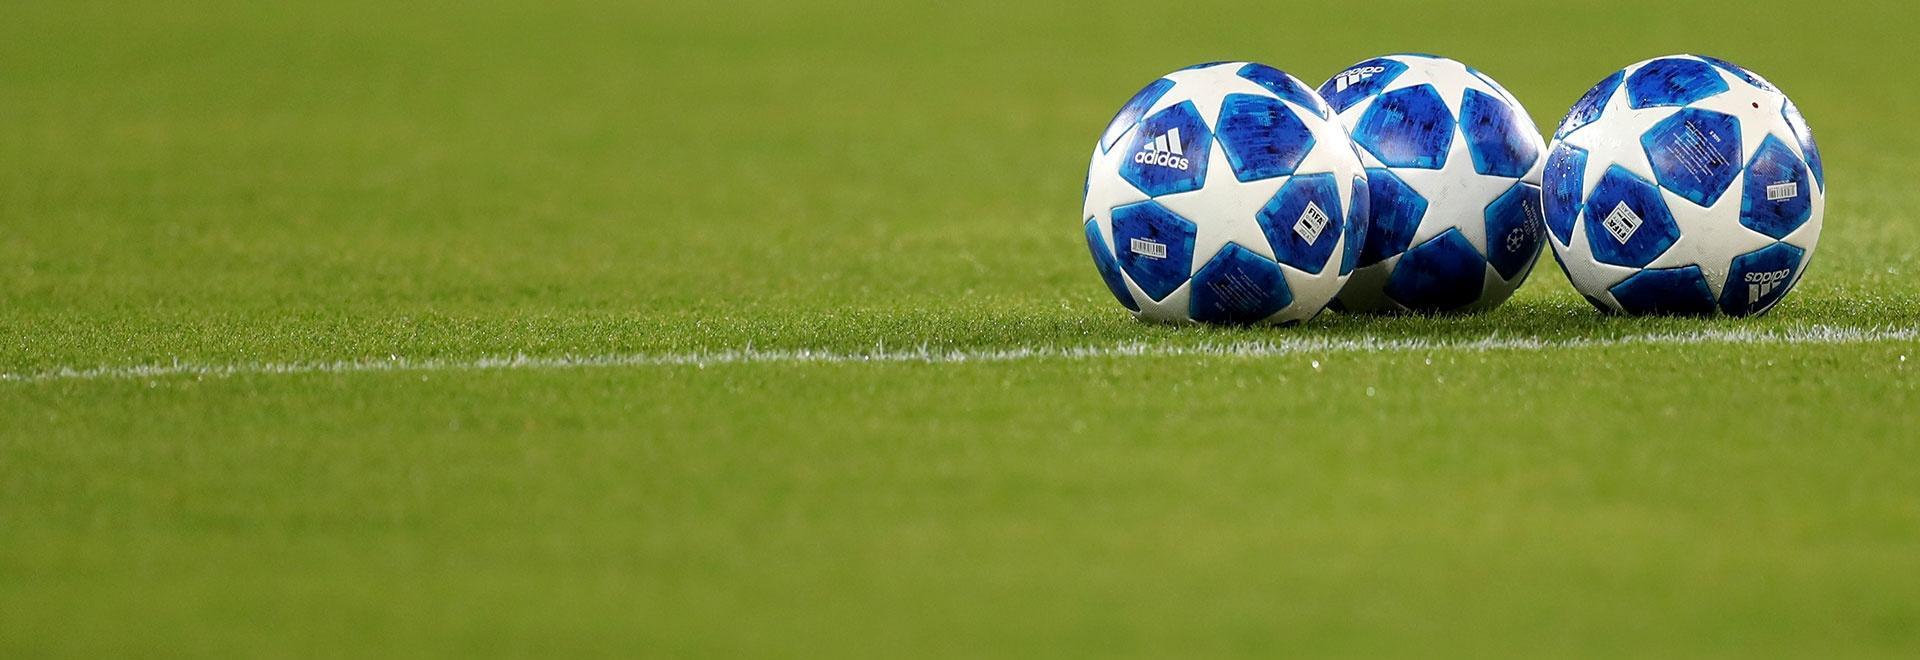 Real Madrid - Atletico M. 28/05/16